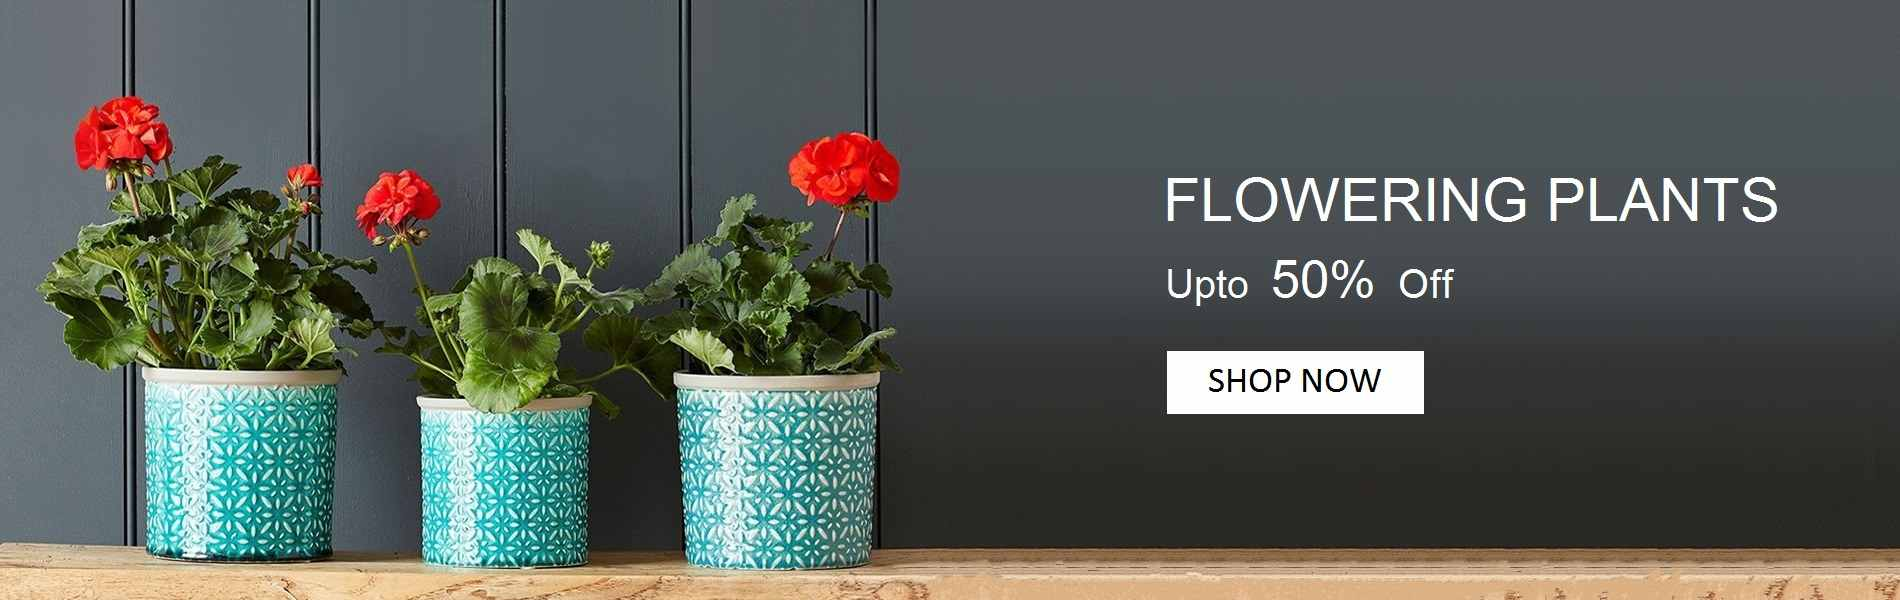 Yoidentity Flower Plants Online